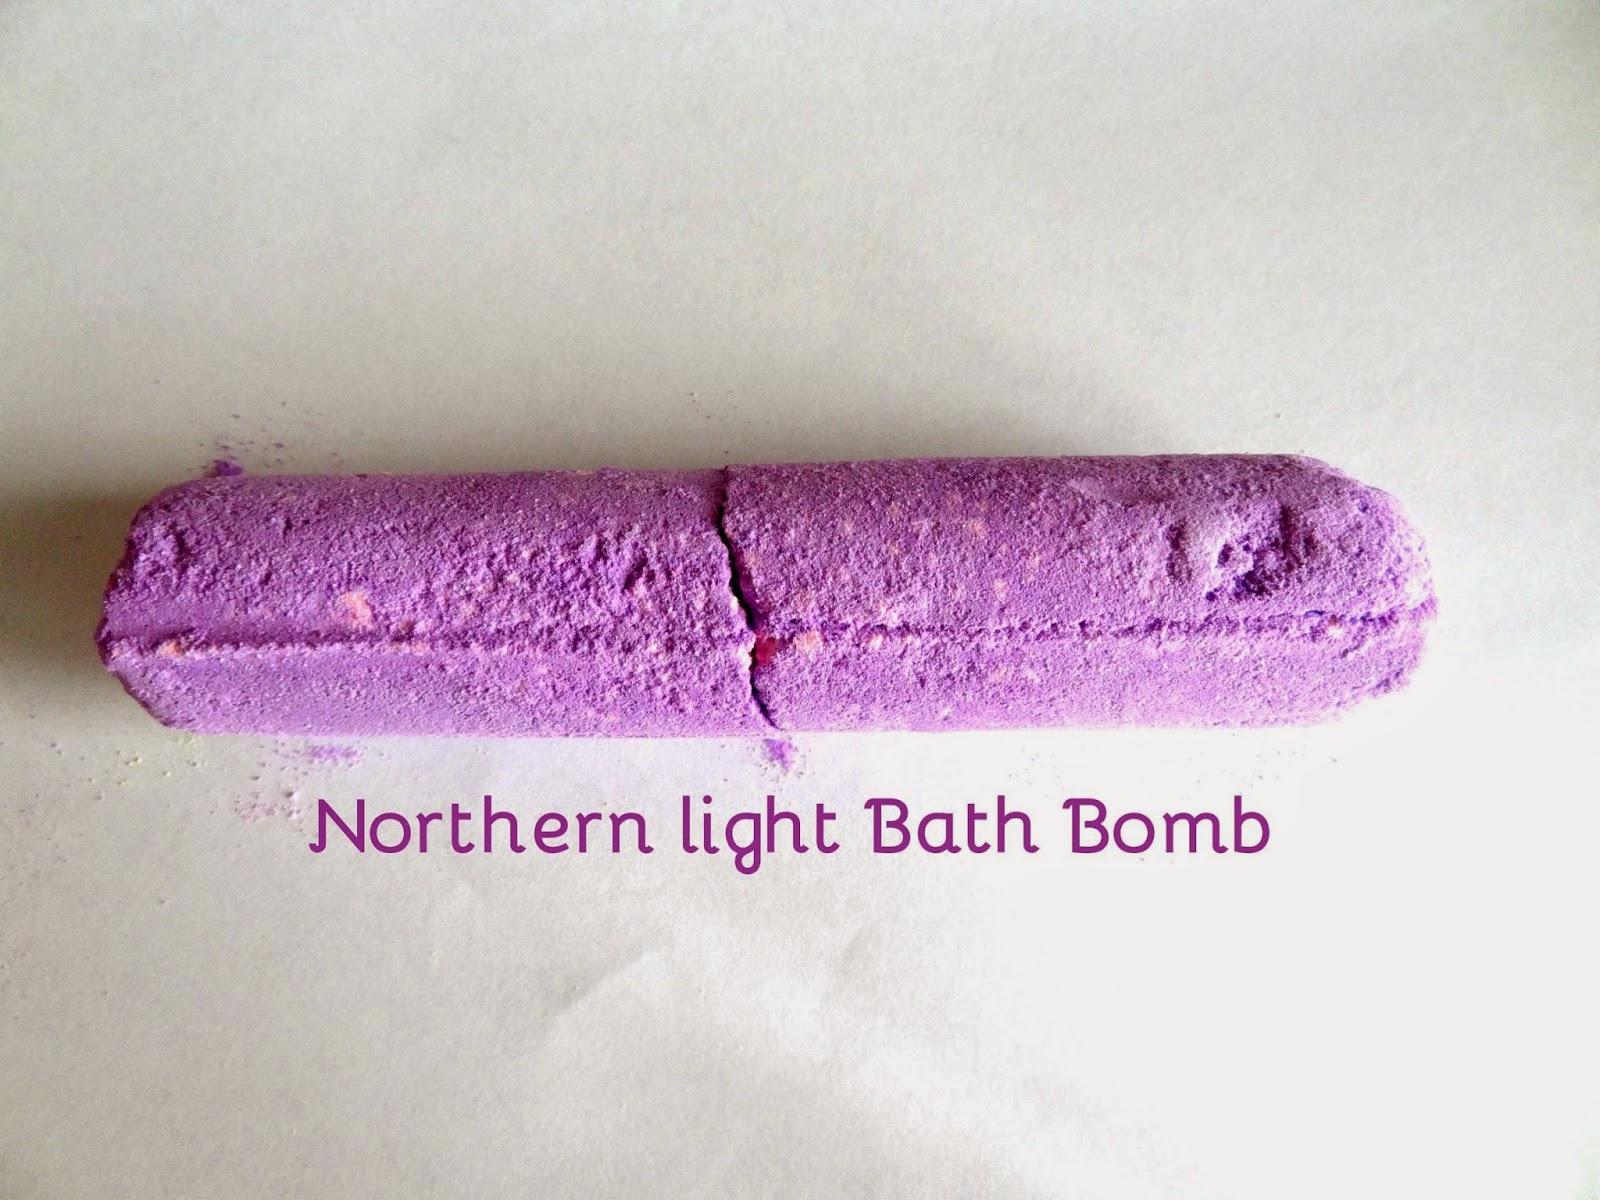 Nothern Lights Bath Balm